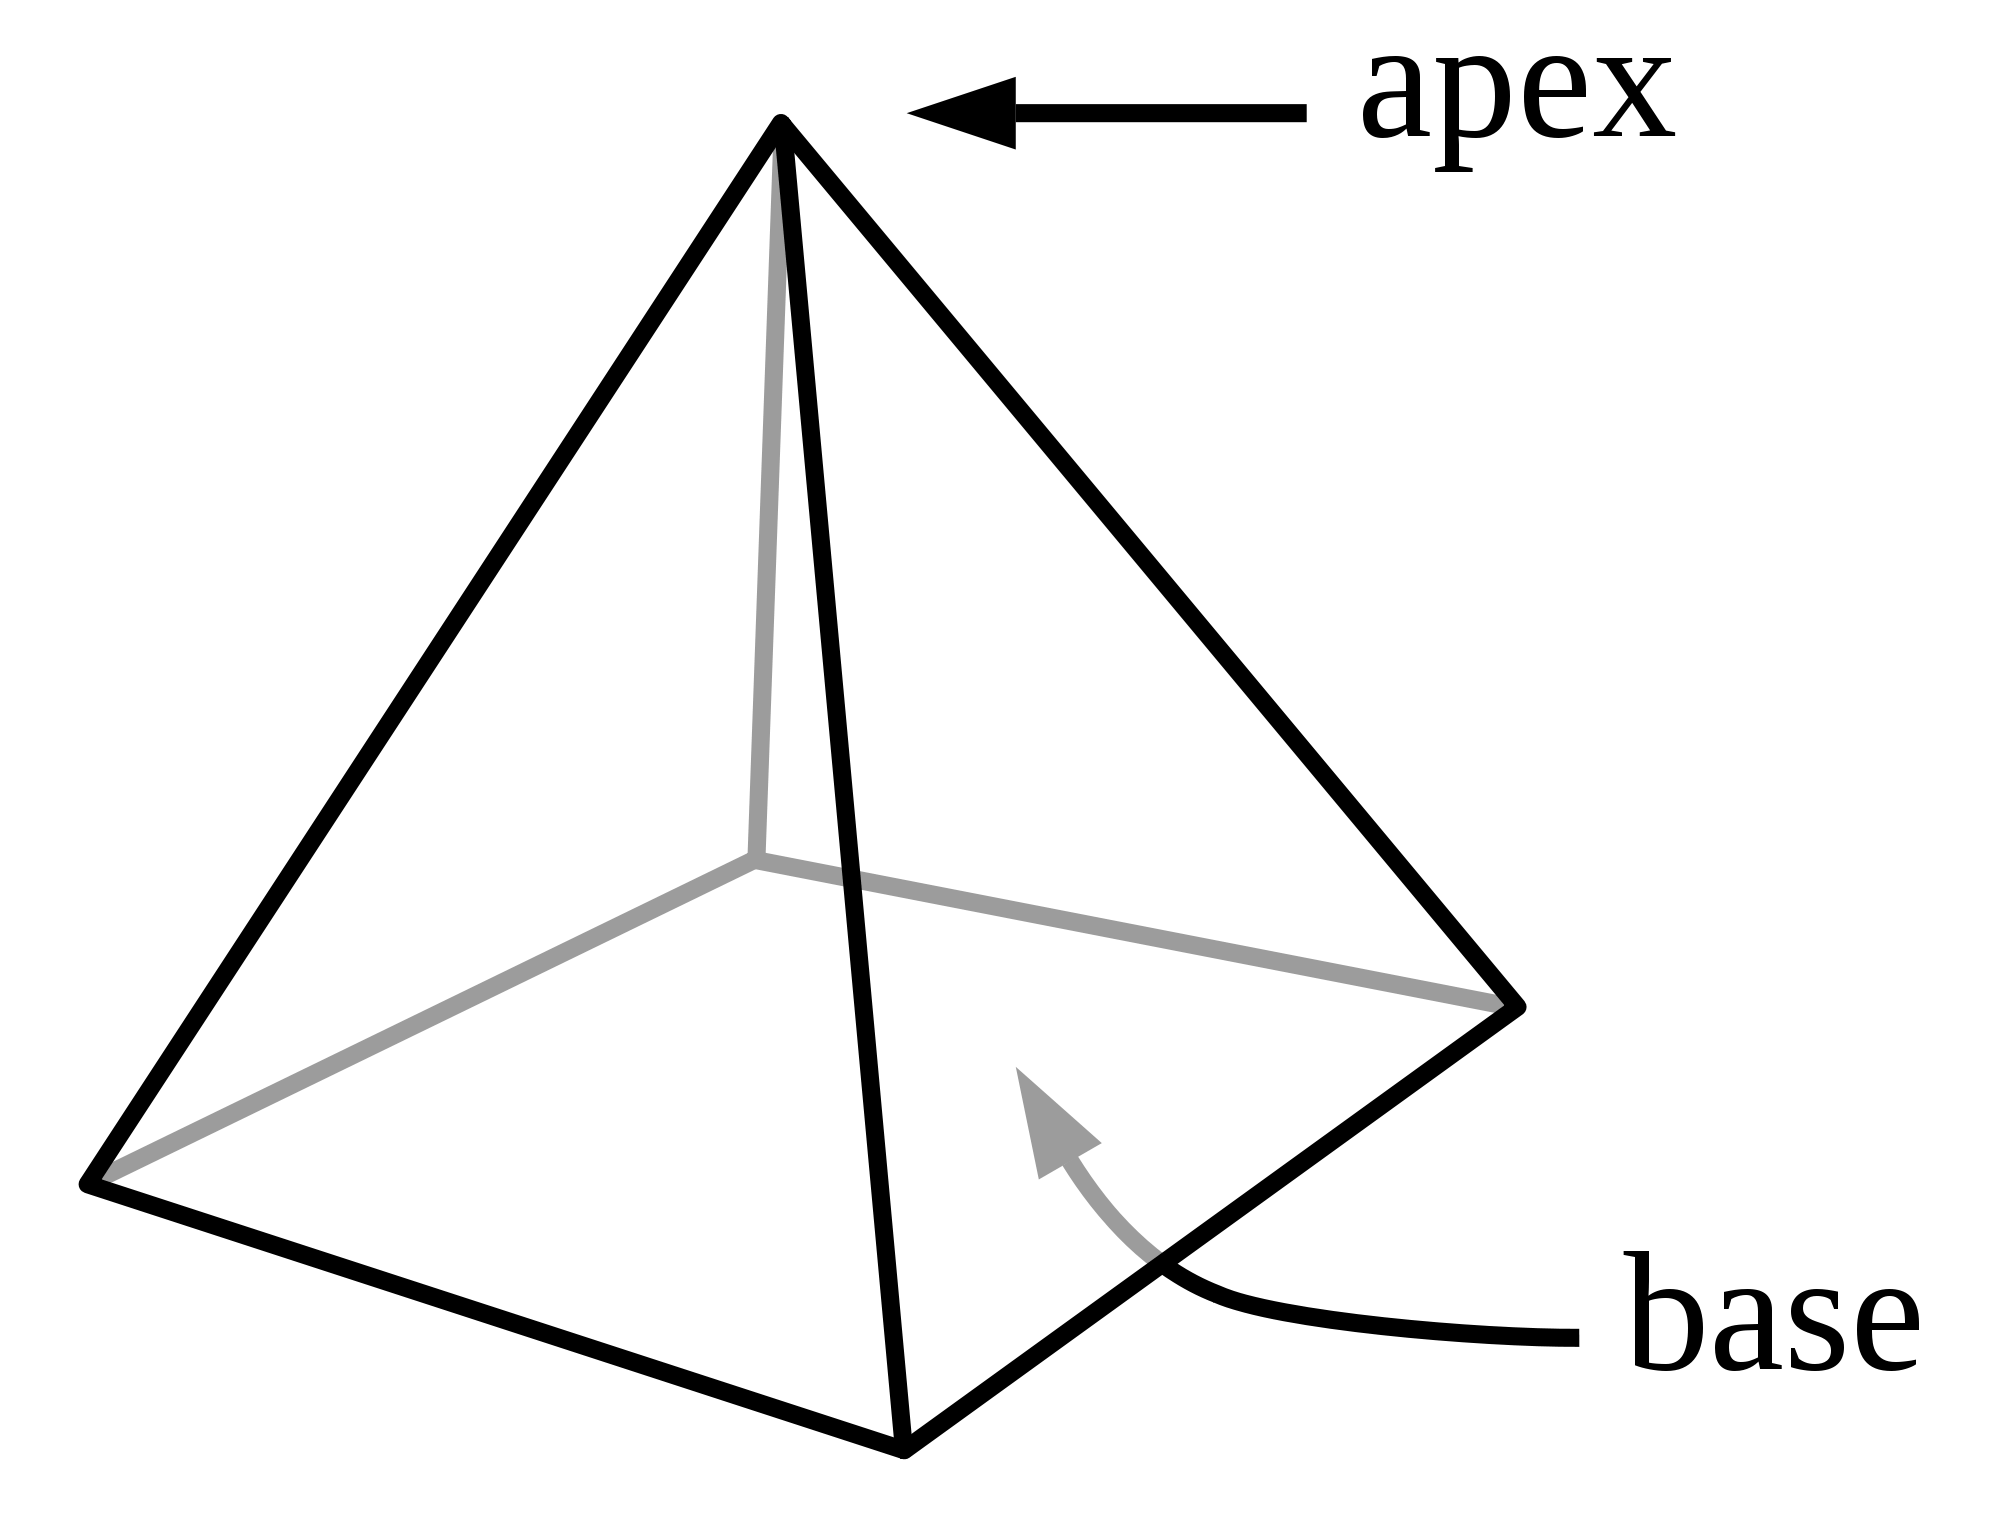 Square Clipart Quadrilateral Shape Square Quadrilateral